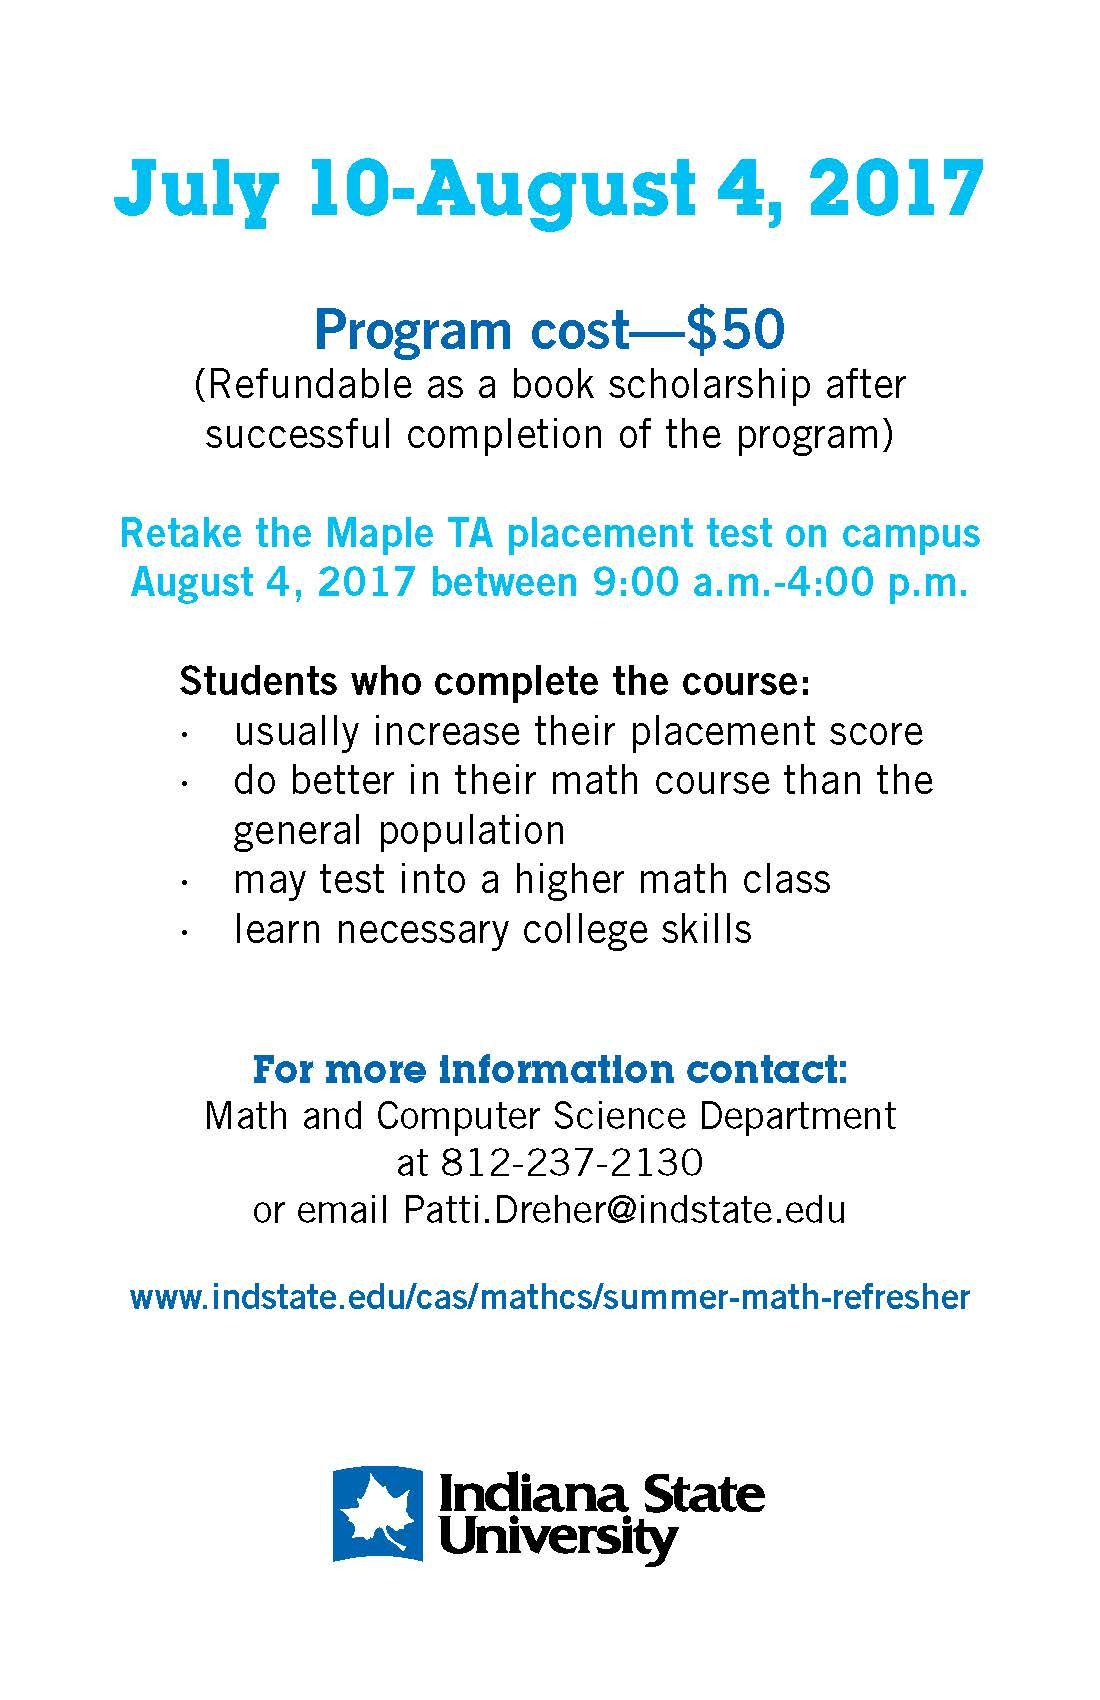 Summer Math Refresher Handbill